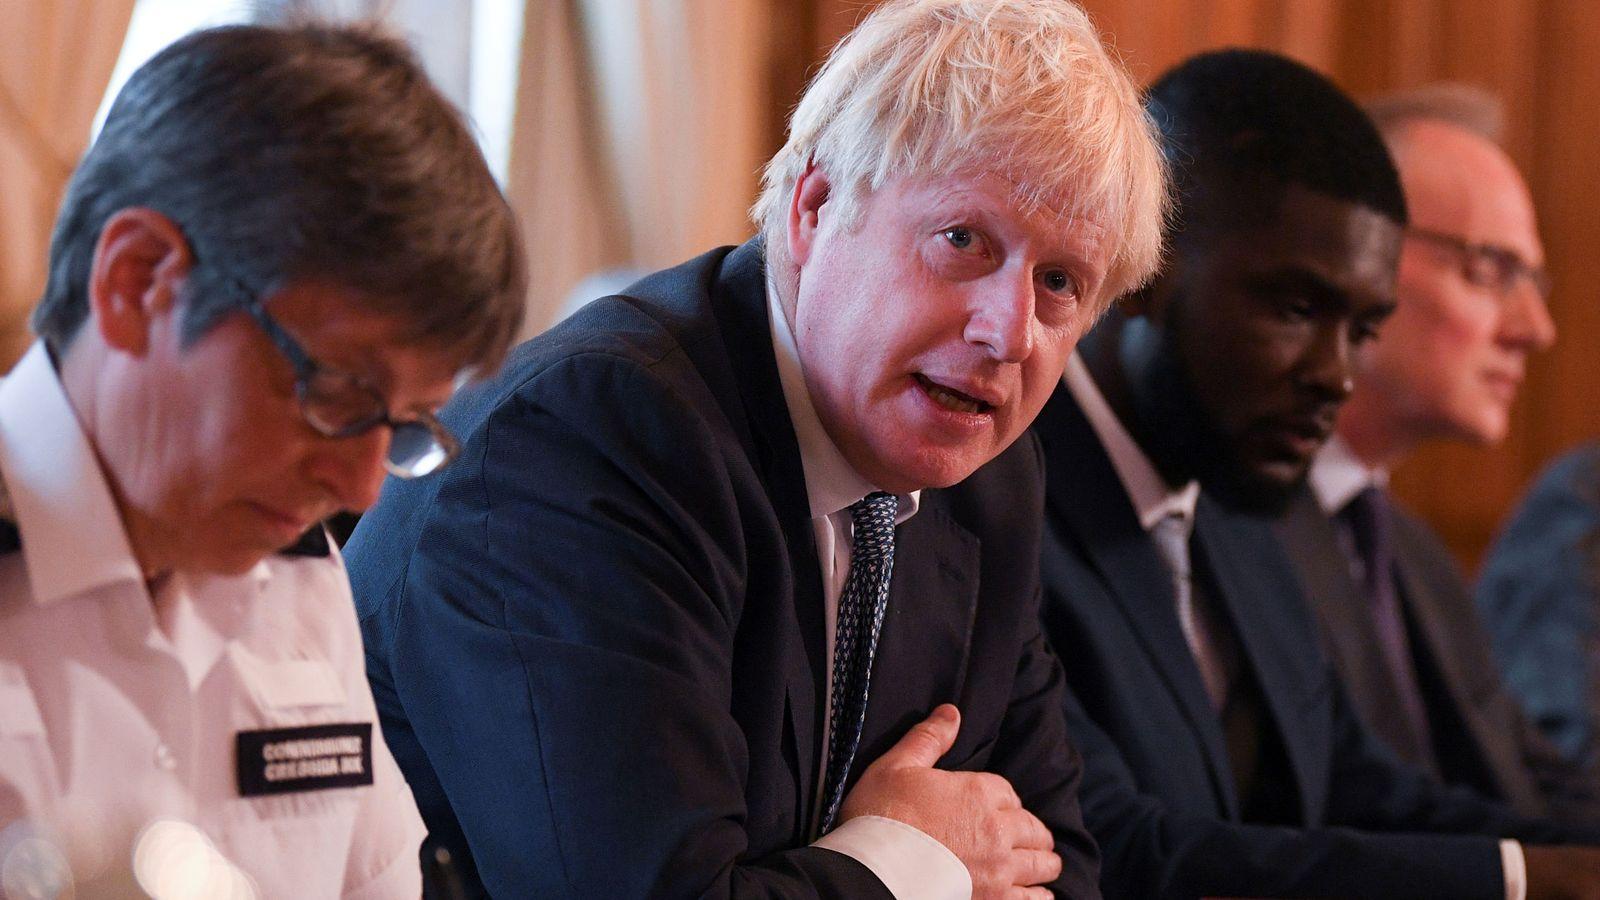 Foto: El nuevo primer ministro británico, Boris Johnson. (Reuters)